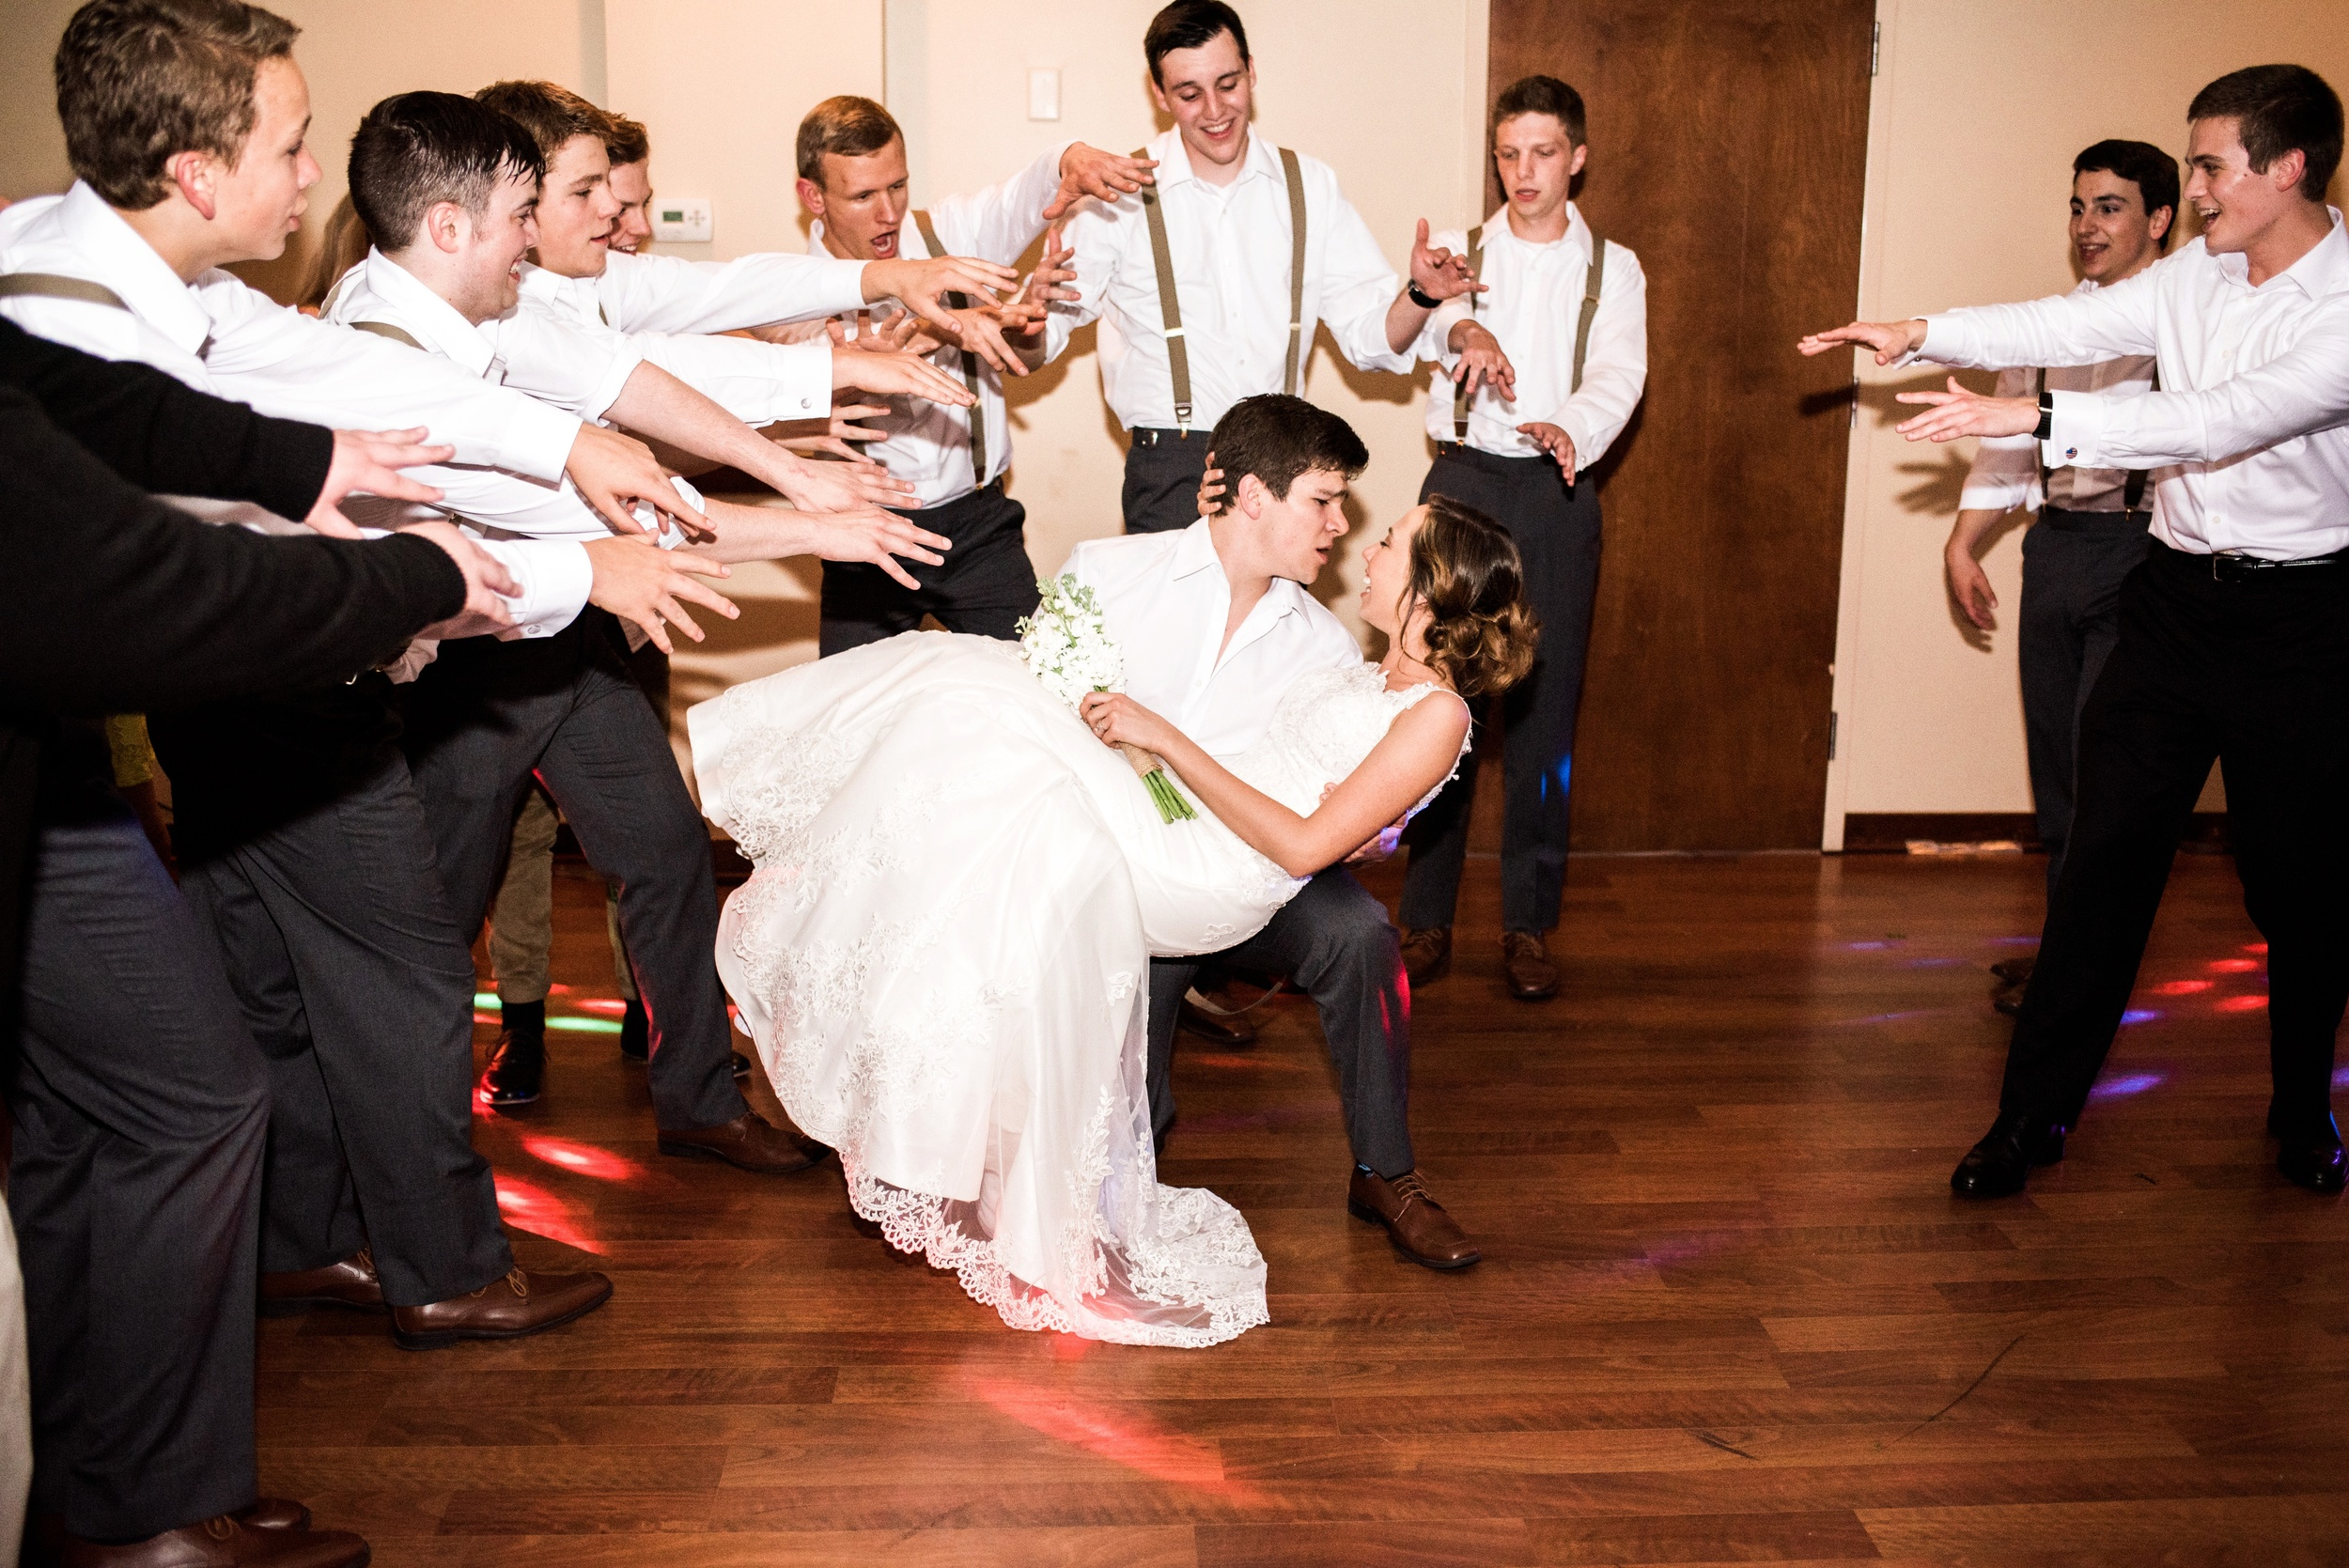 Pleasant Hill Des Moines Wedding Photographer_2209.jpg